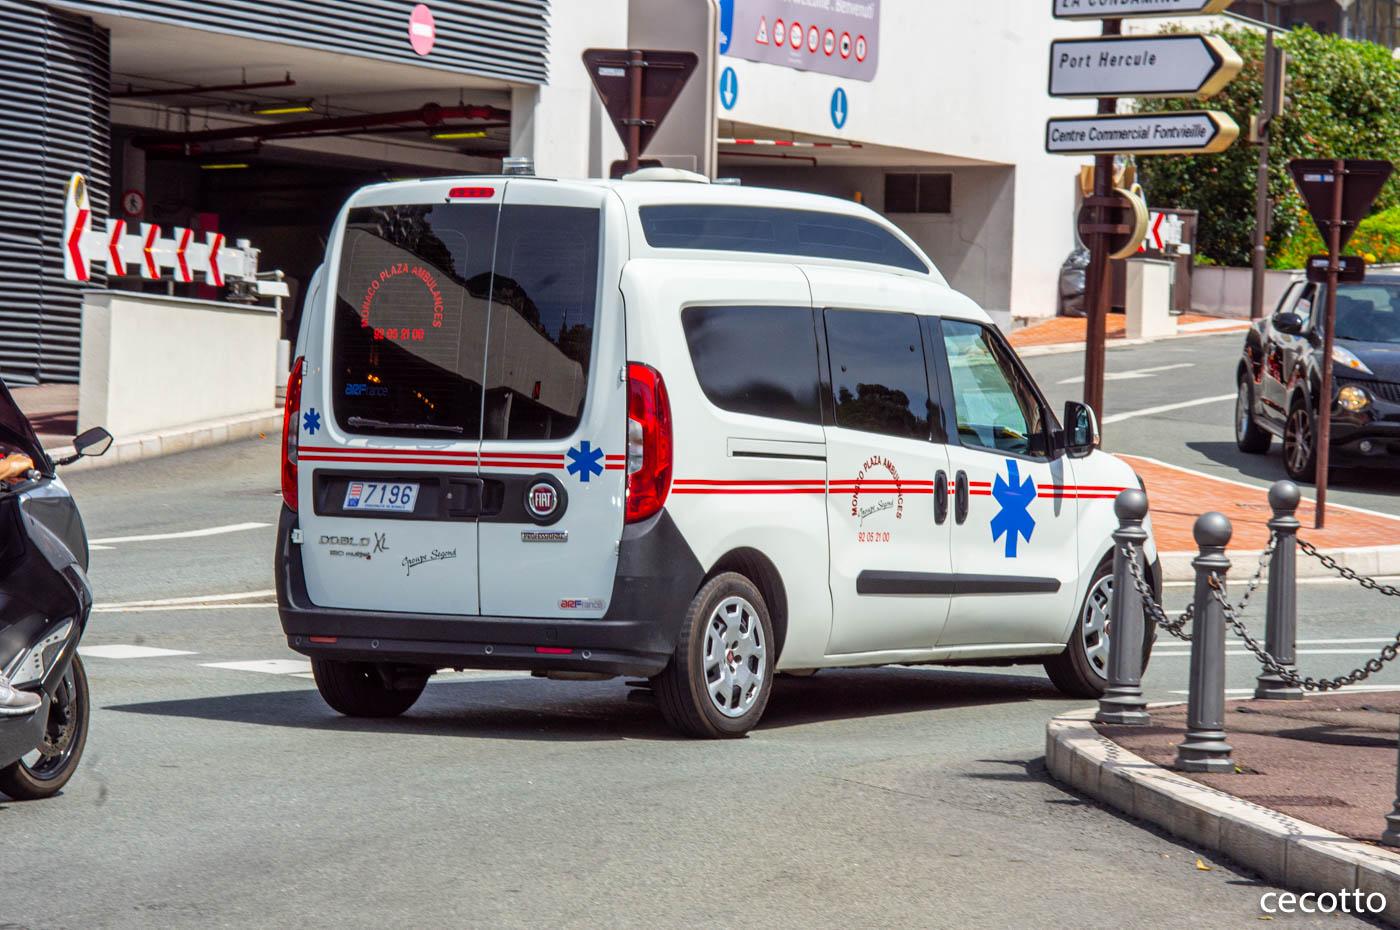 Медицинский автомобиль на базе FIAT Doblo 7196. Monte Carlo